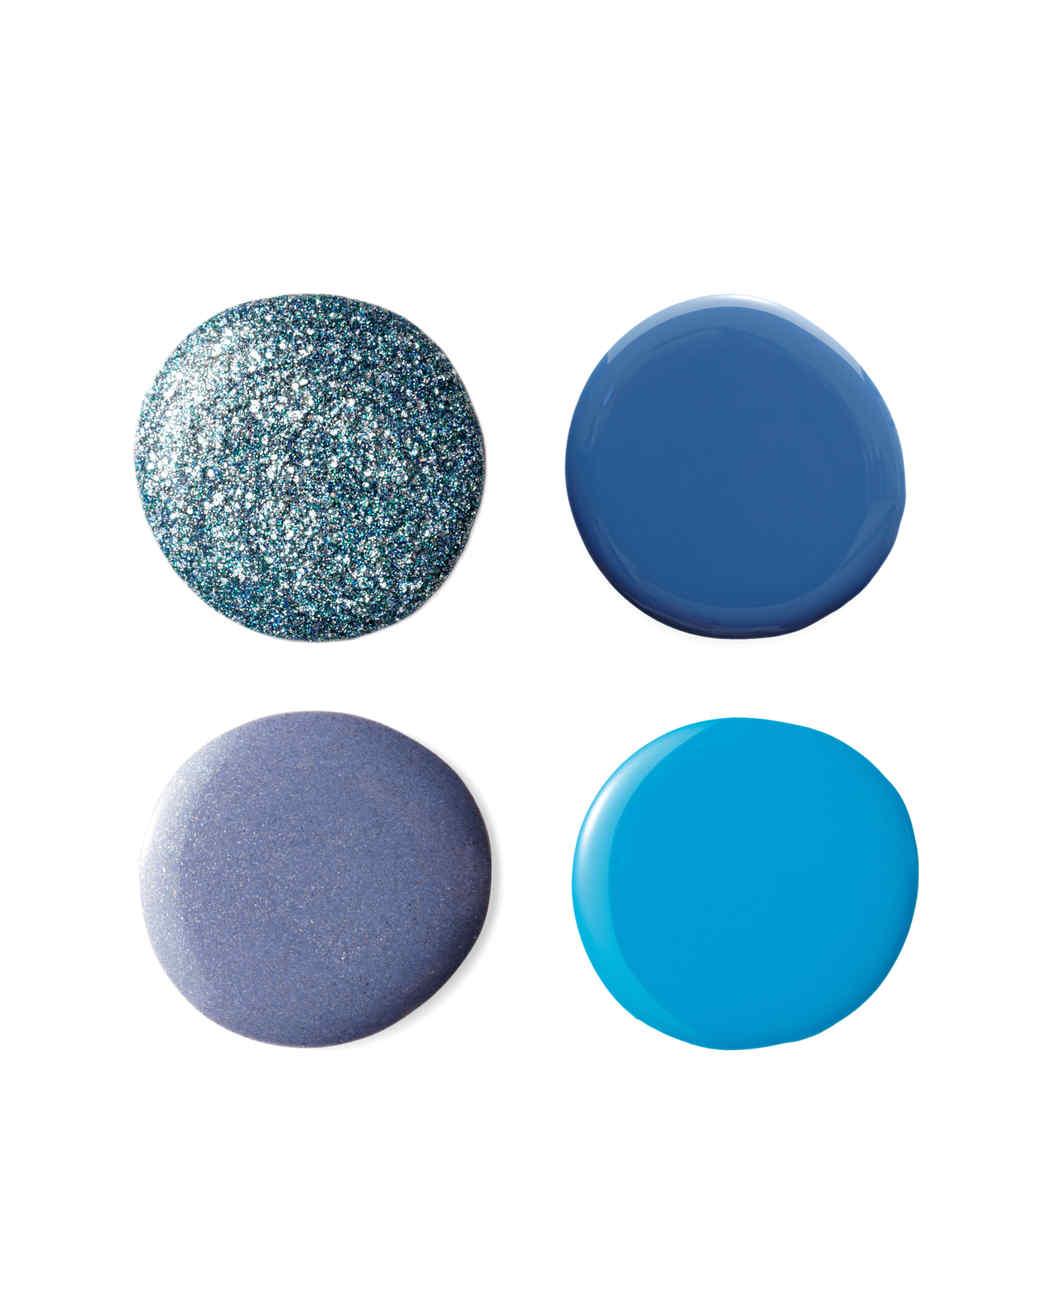 nail-polish-midblues-msl0612.jpg